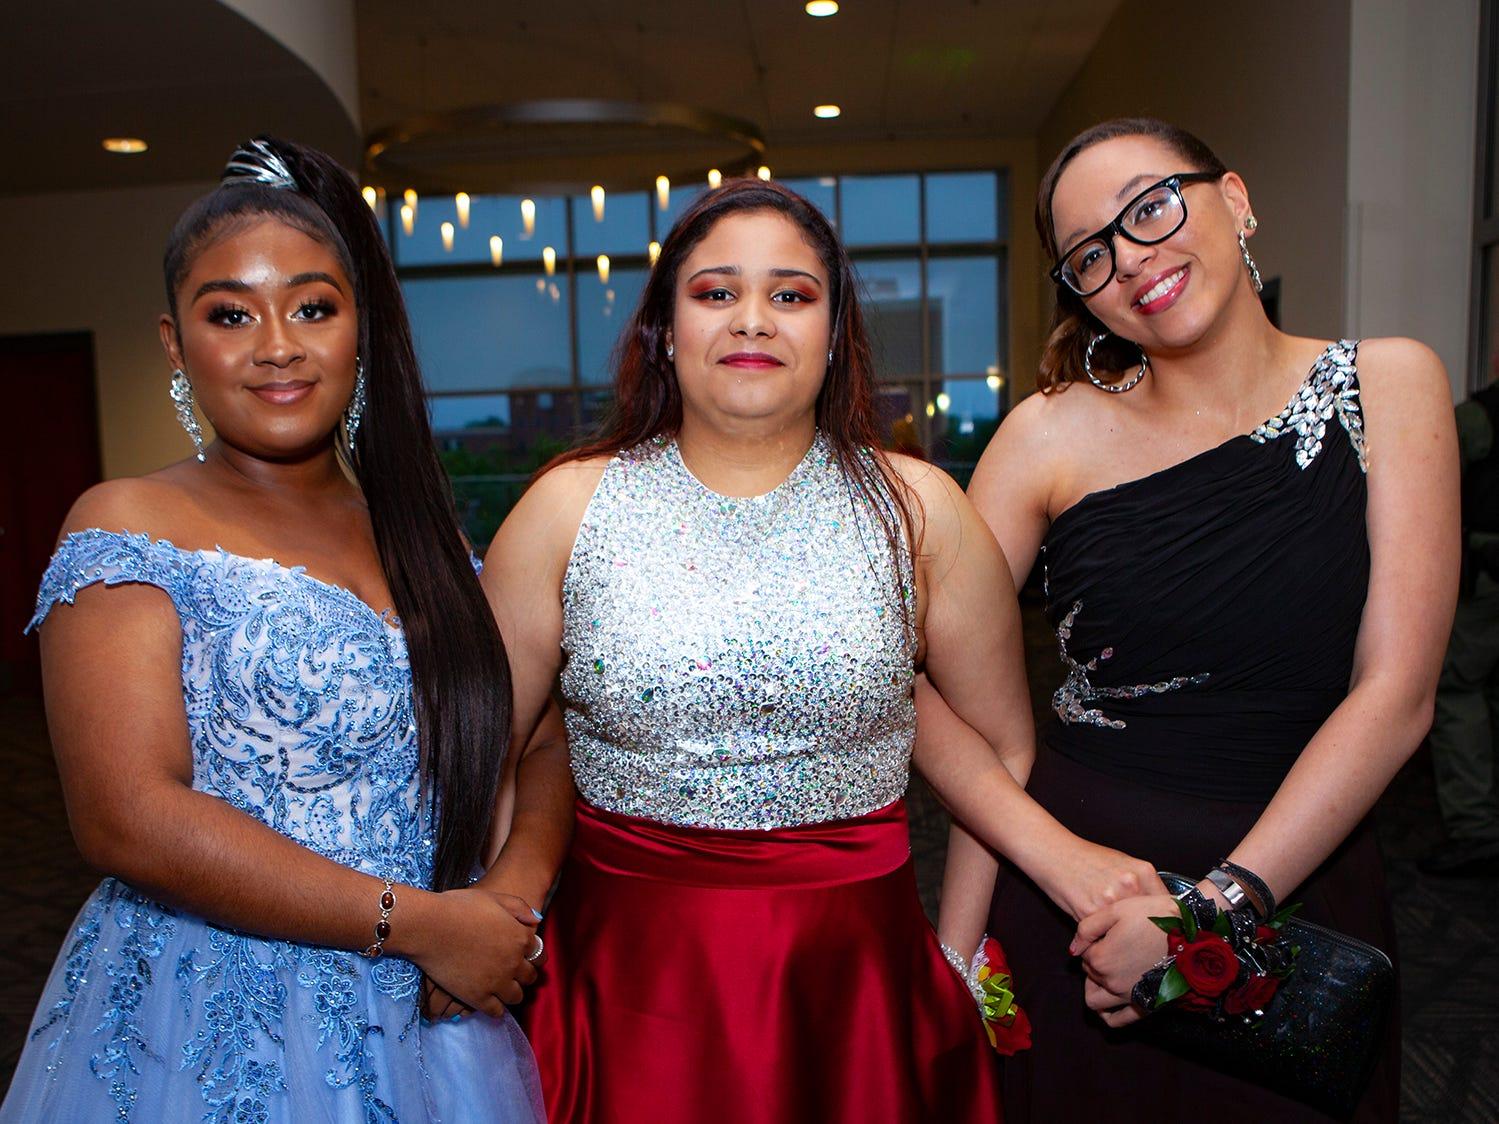 Sydney Jackson, Emily Mercado and Shaolin Eady La Vergne High's prom, held Saturday, May 4, 2019 at MTSU's Student Union Building.